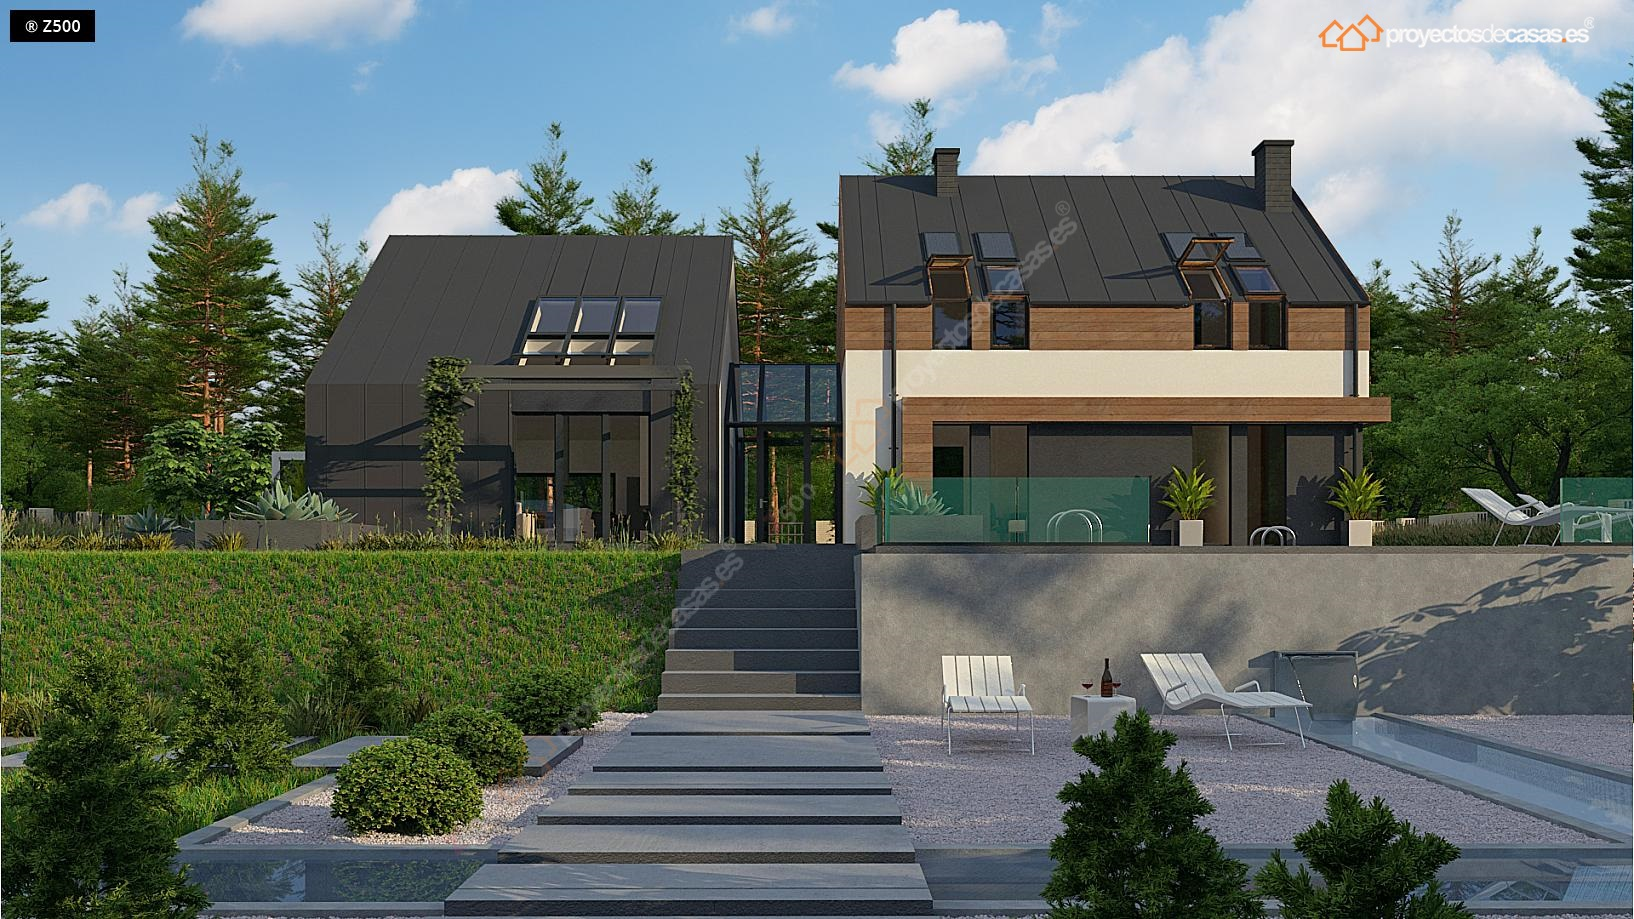 proyectos de casas | casa de diseño original - proyectosdecasas